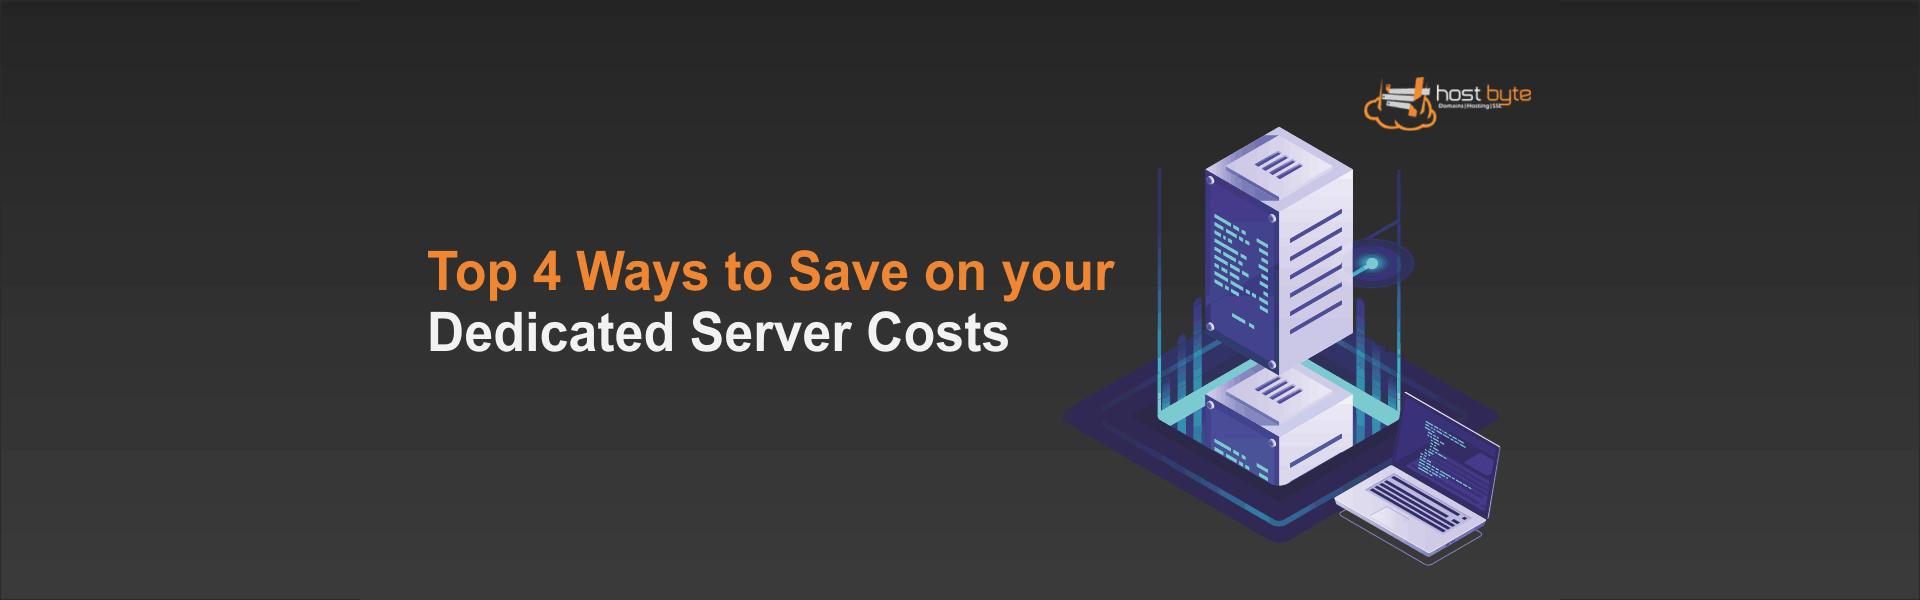 Dedicated Server Expenses